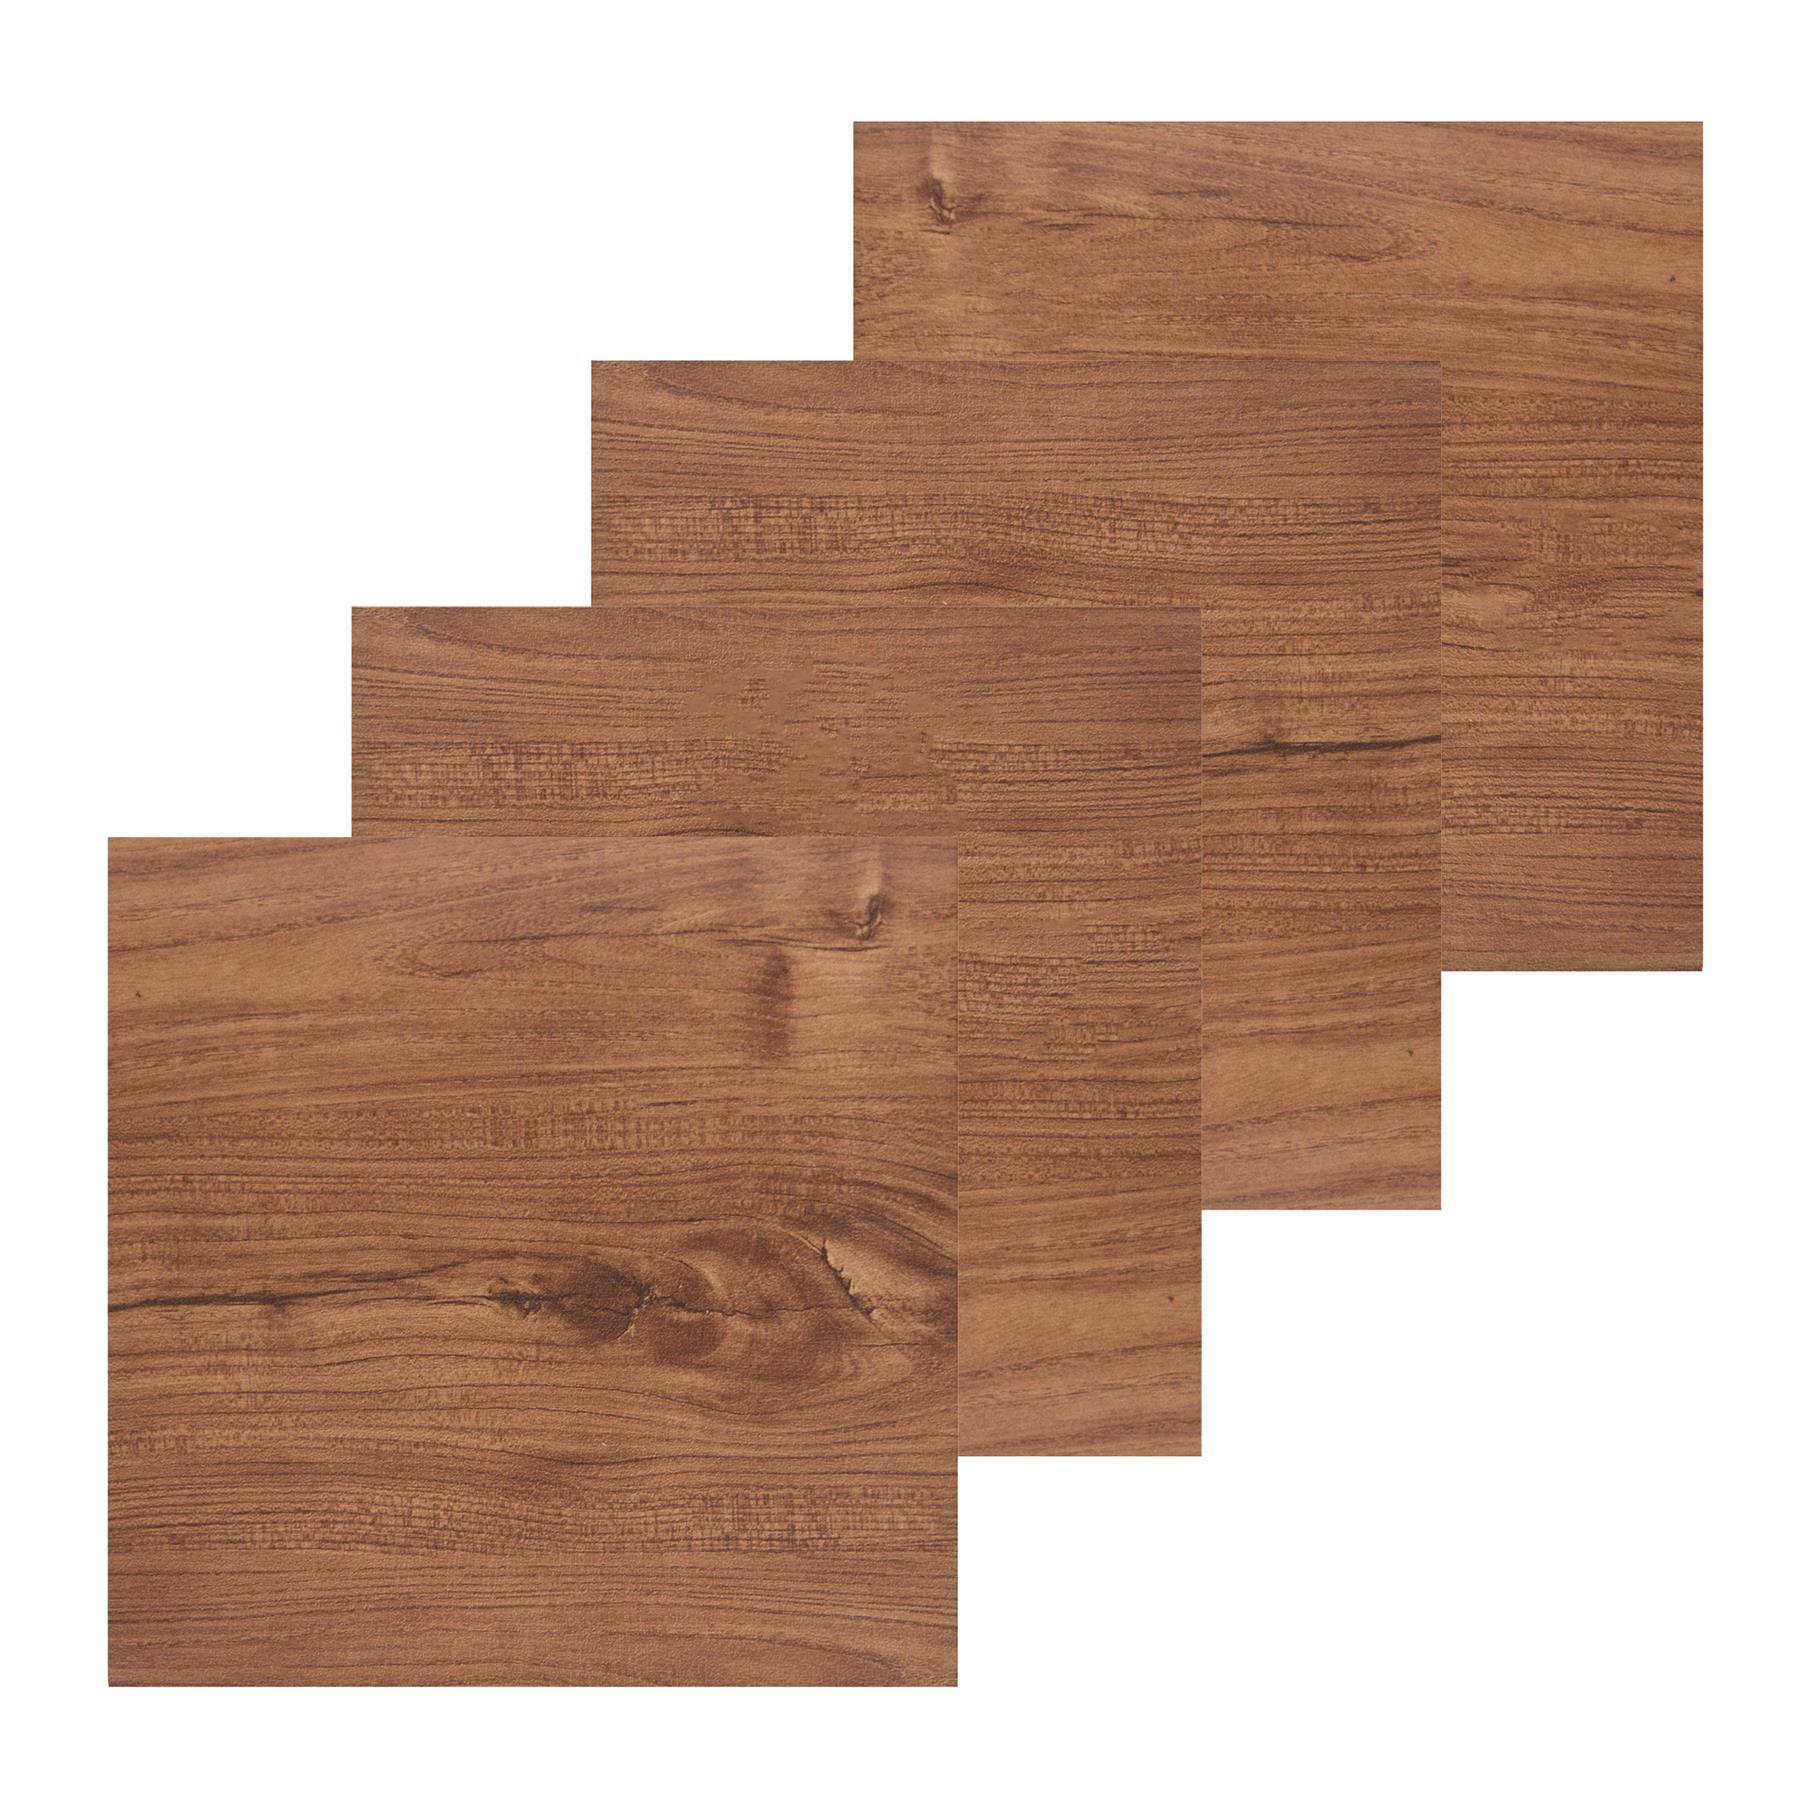 Floor-Tiles-Self-Adhesive-Vinyl-Flooring-Kitchen-Bathroom-Brown-Wood-Grain thumbnail 32